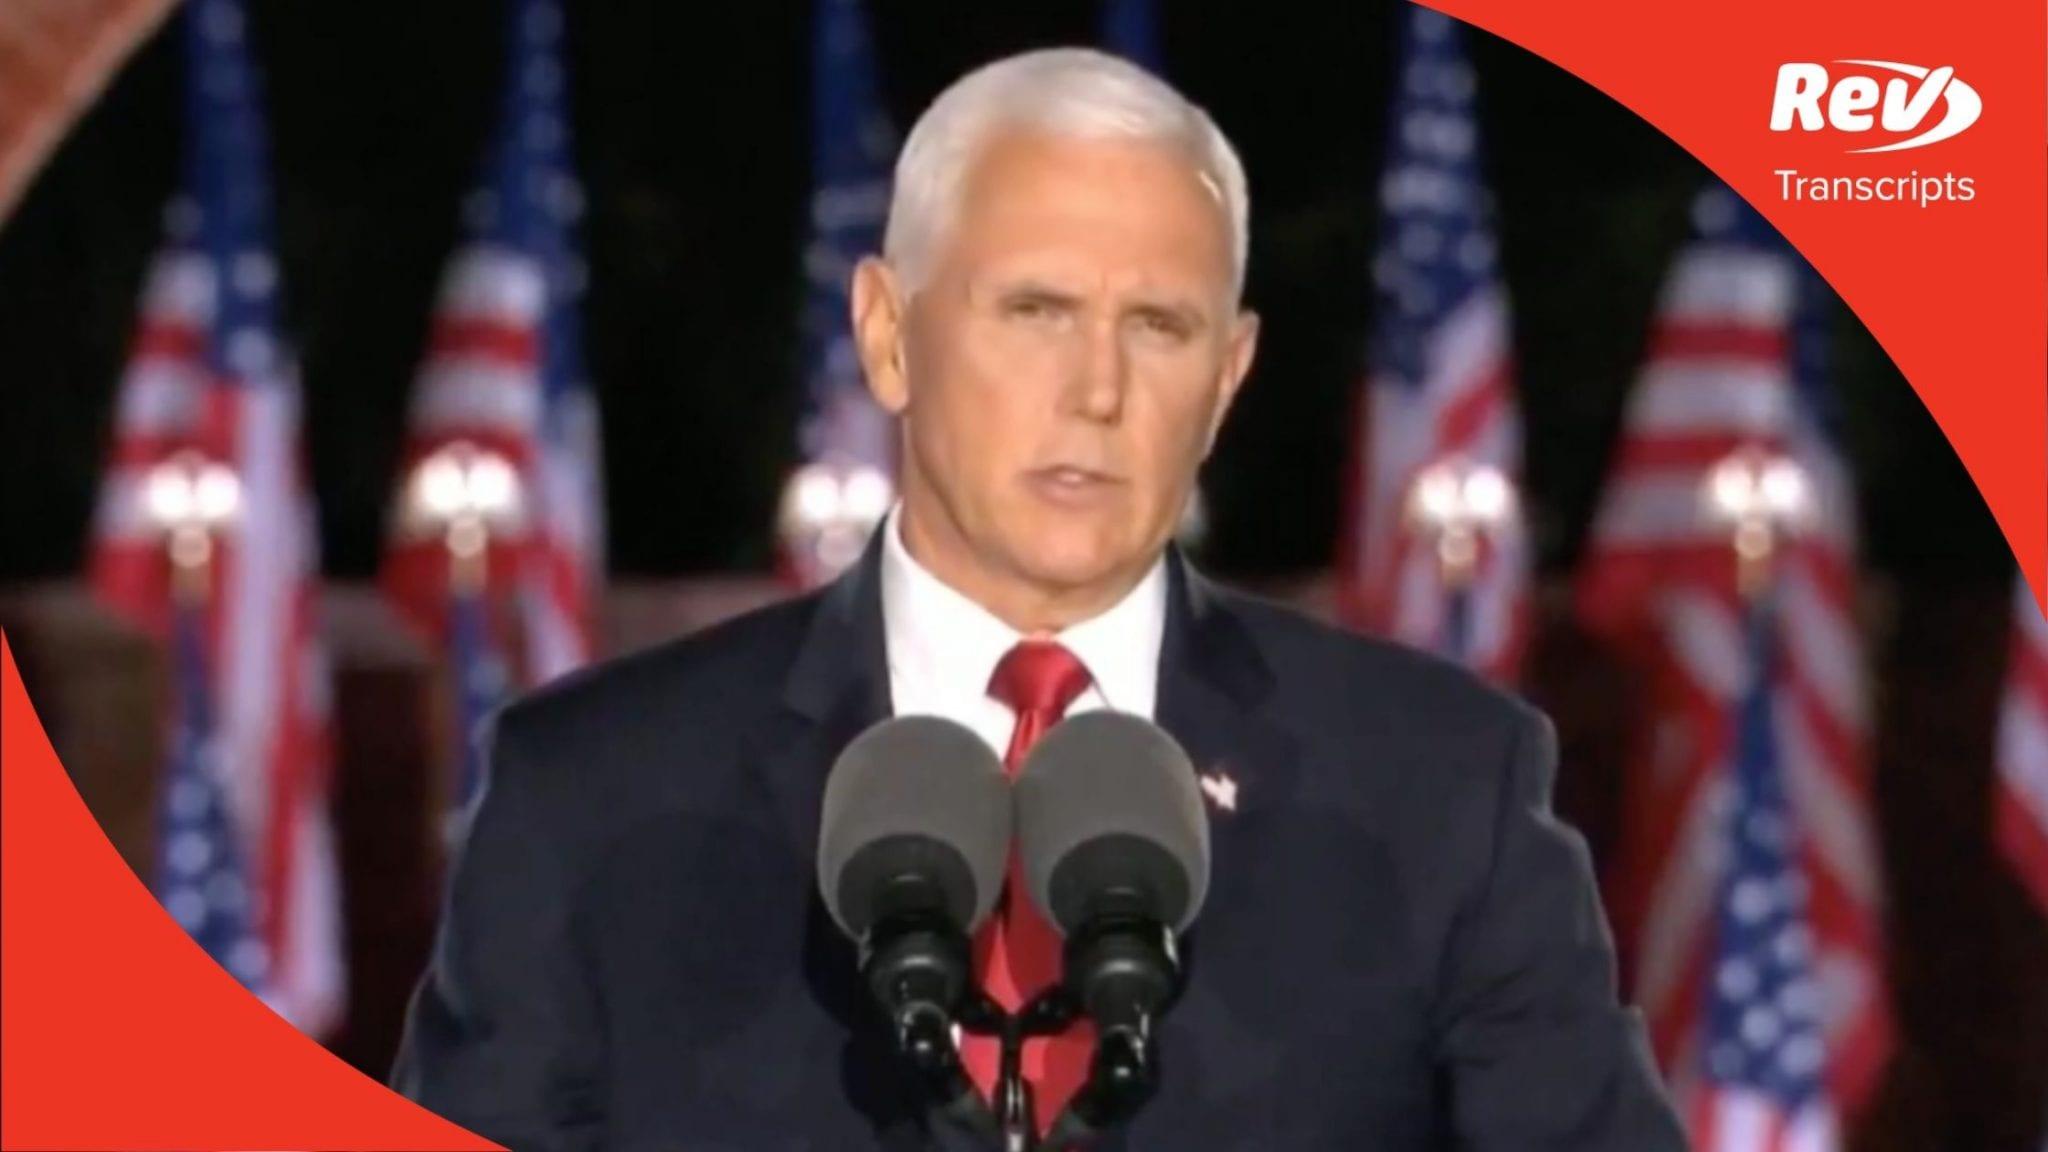 Mike Pence 2020 RNC Speech Transcript